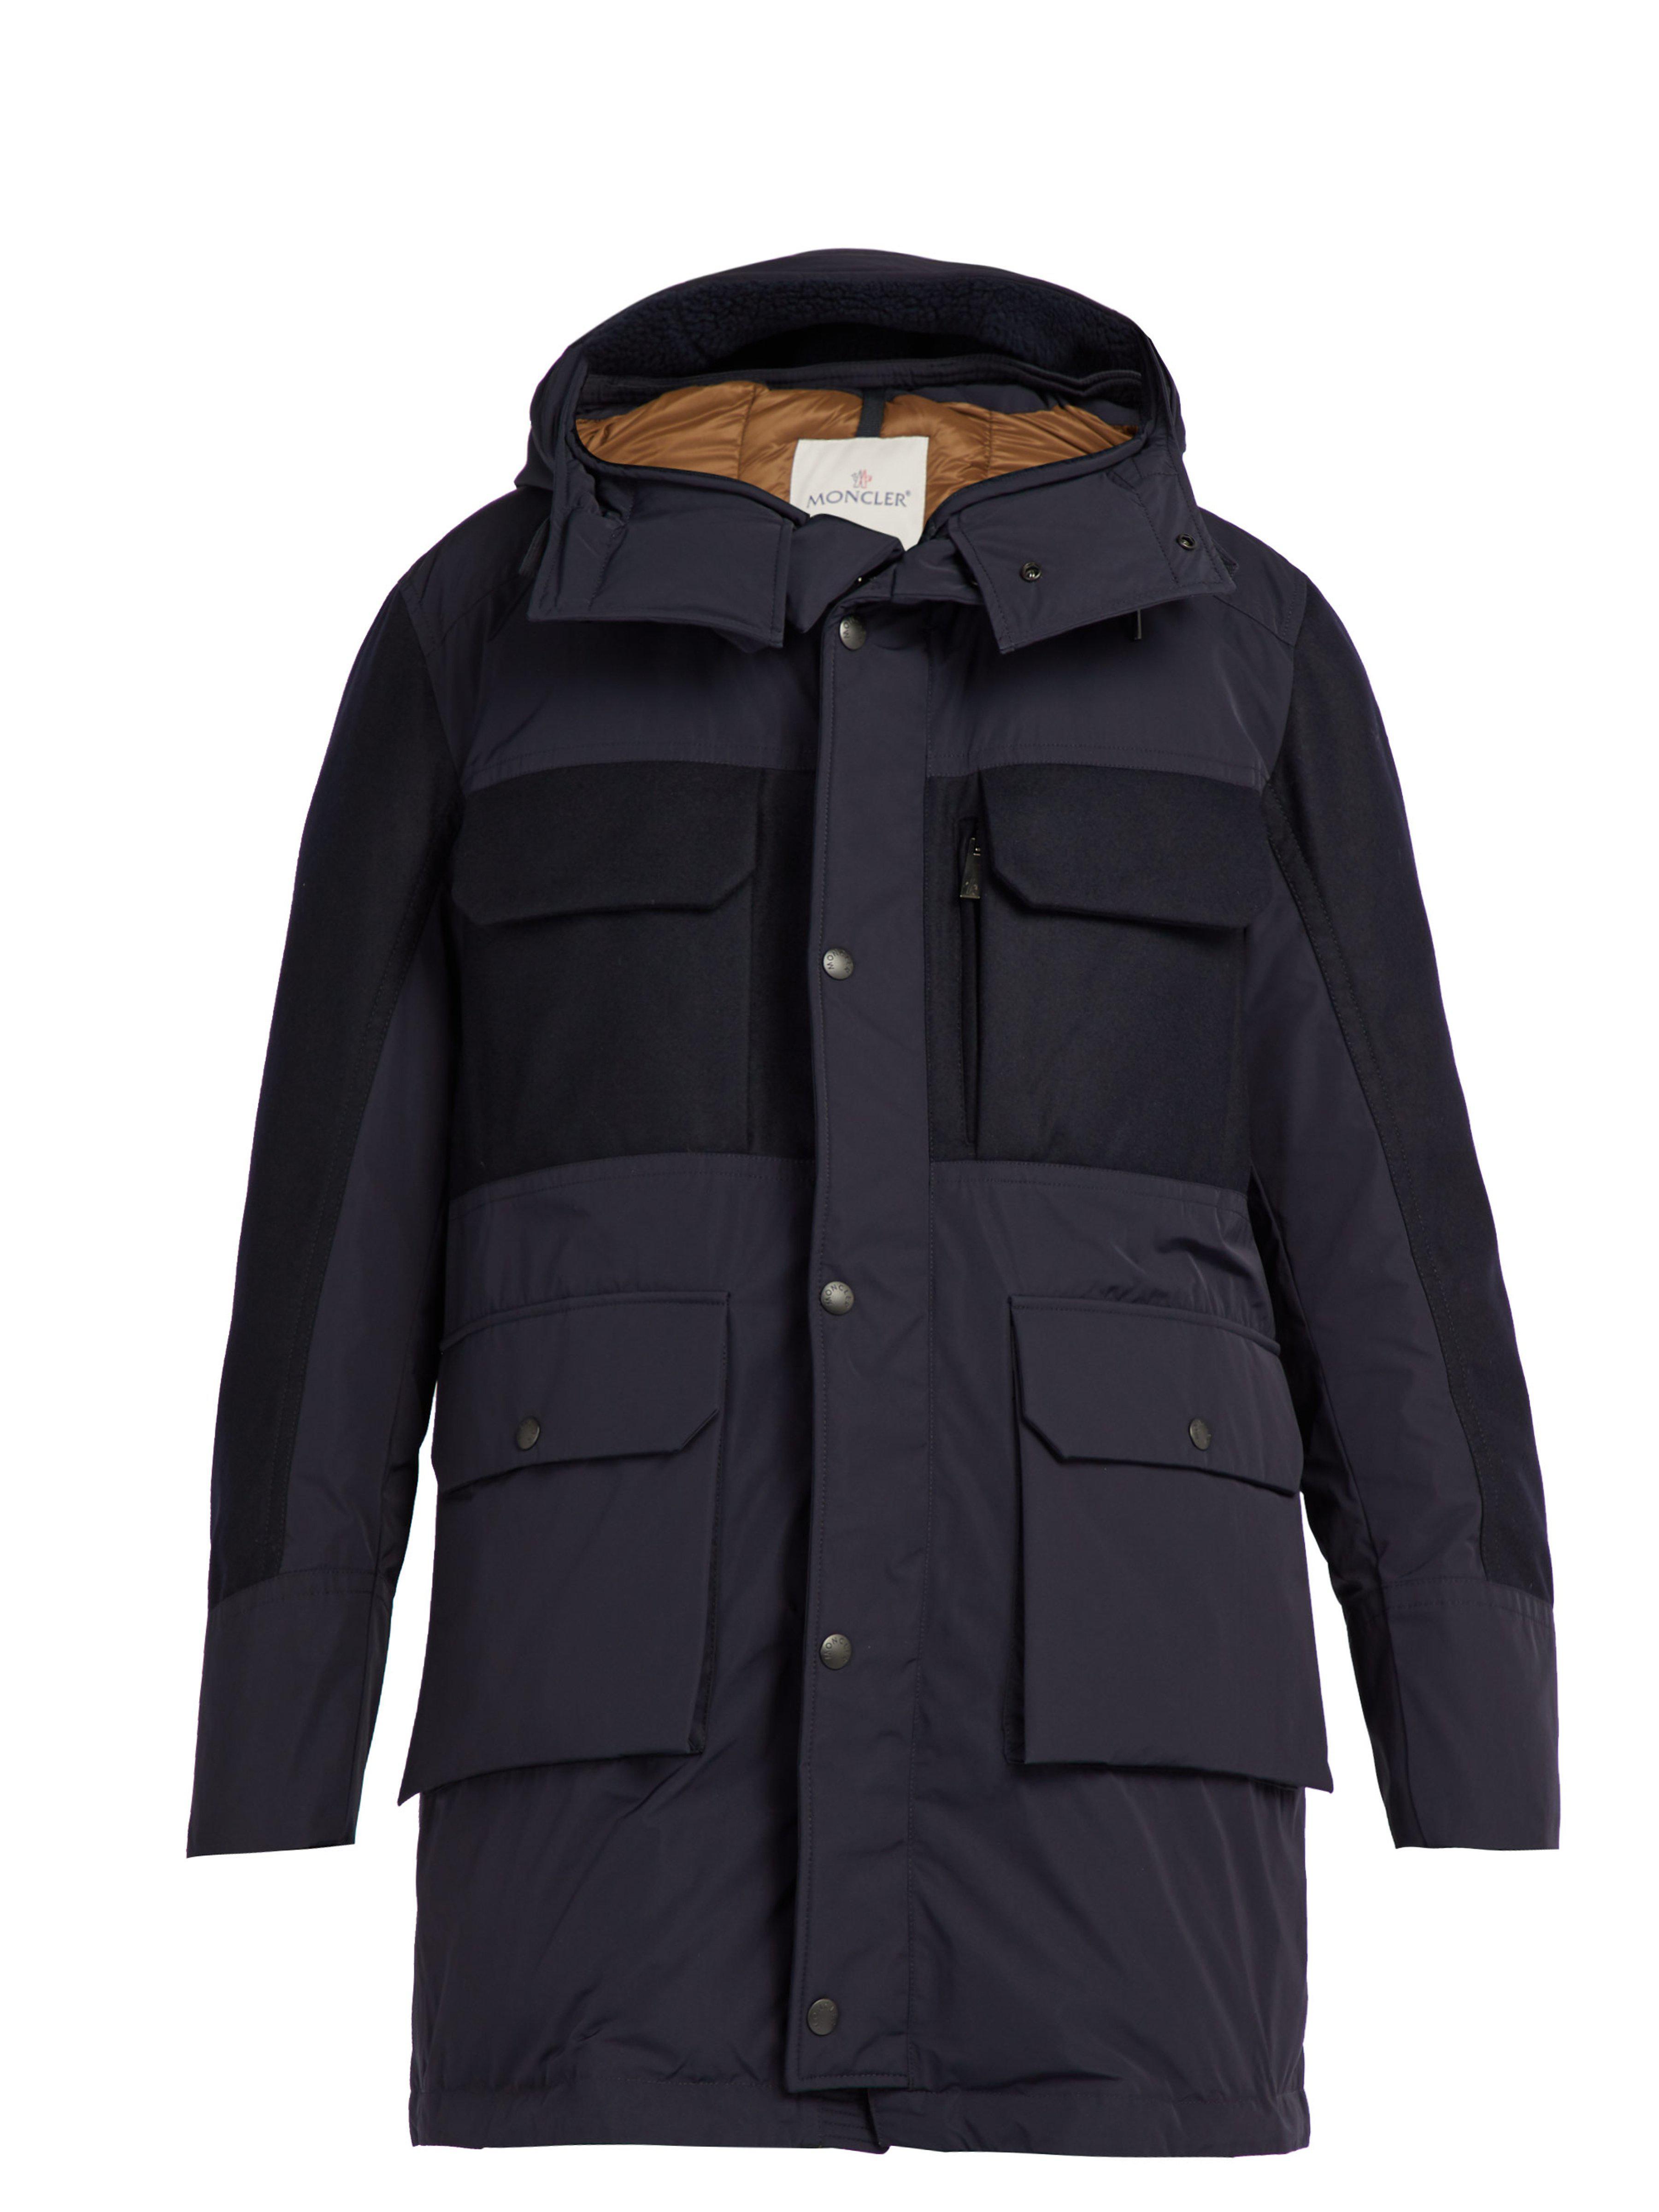 717794d28165 Moncler Perrault Hooded Down Parka in Blue for Men - Lyst